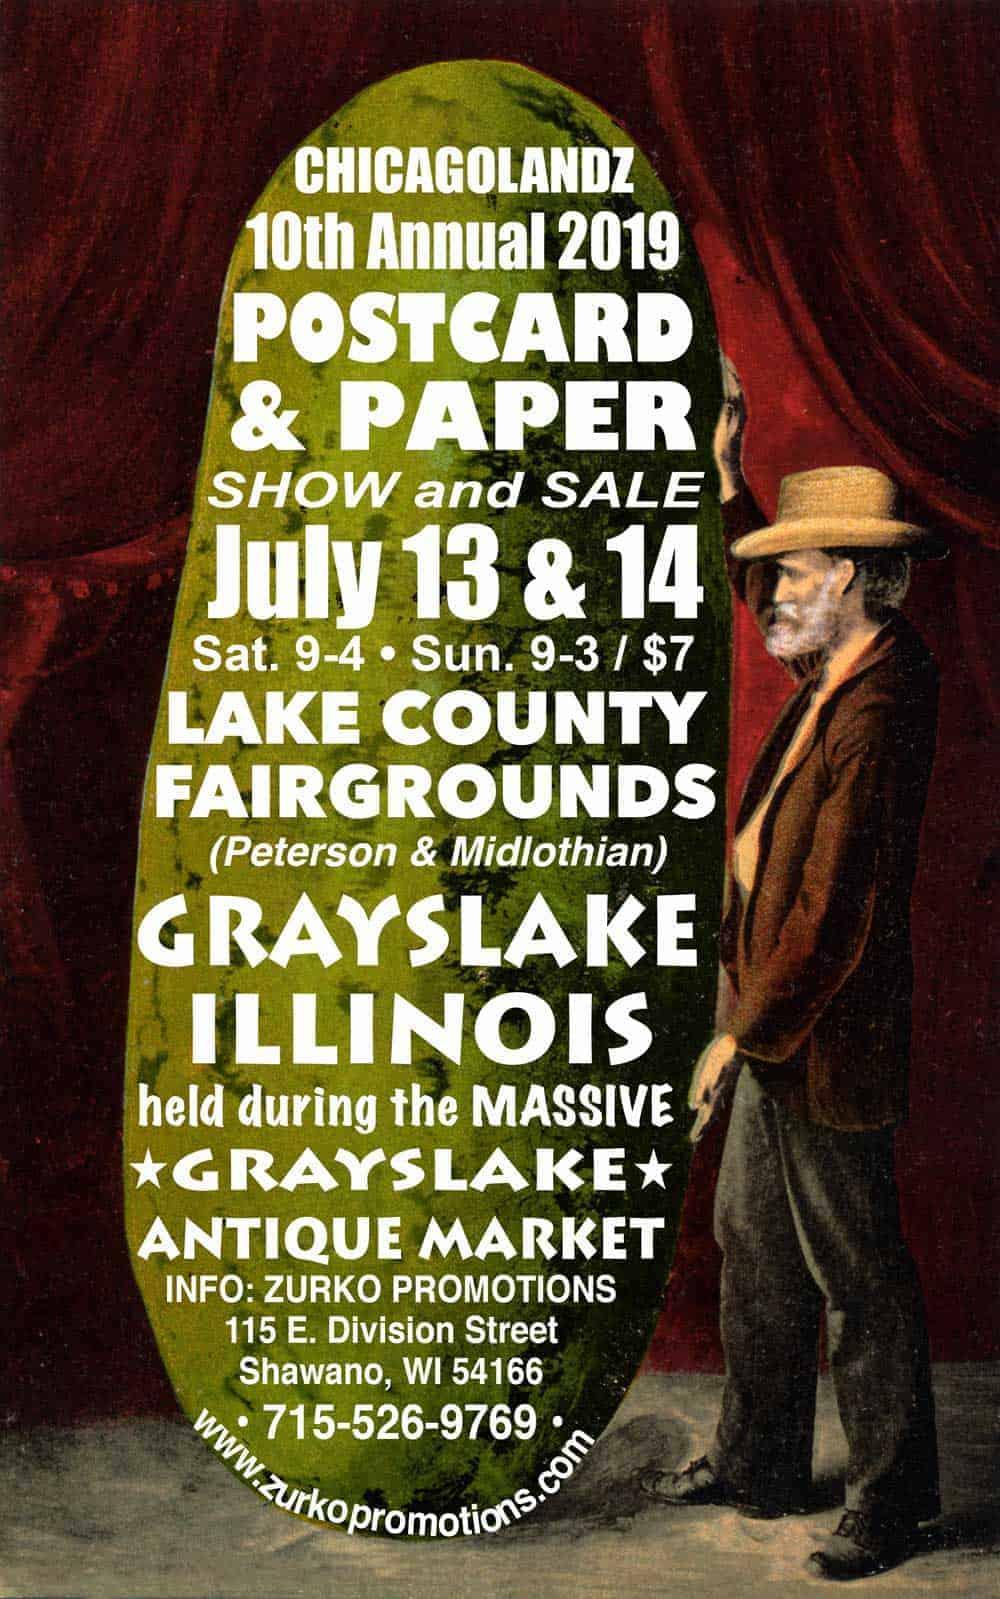 Chicago Grayslake Illinois Antique Vintage Market Postcard and Paper Show